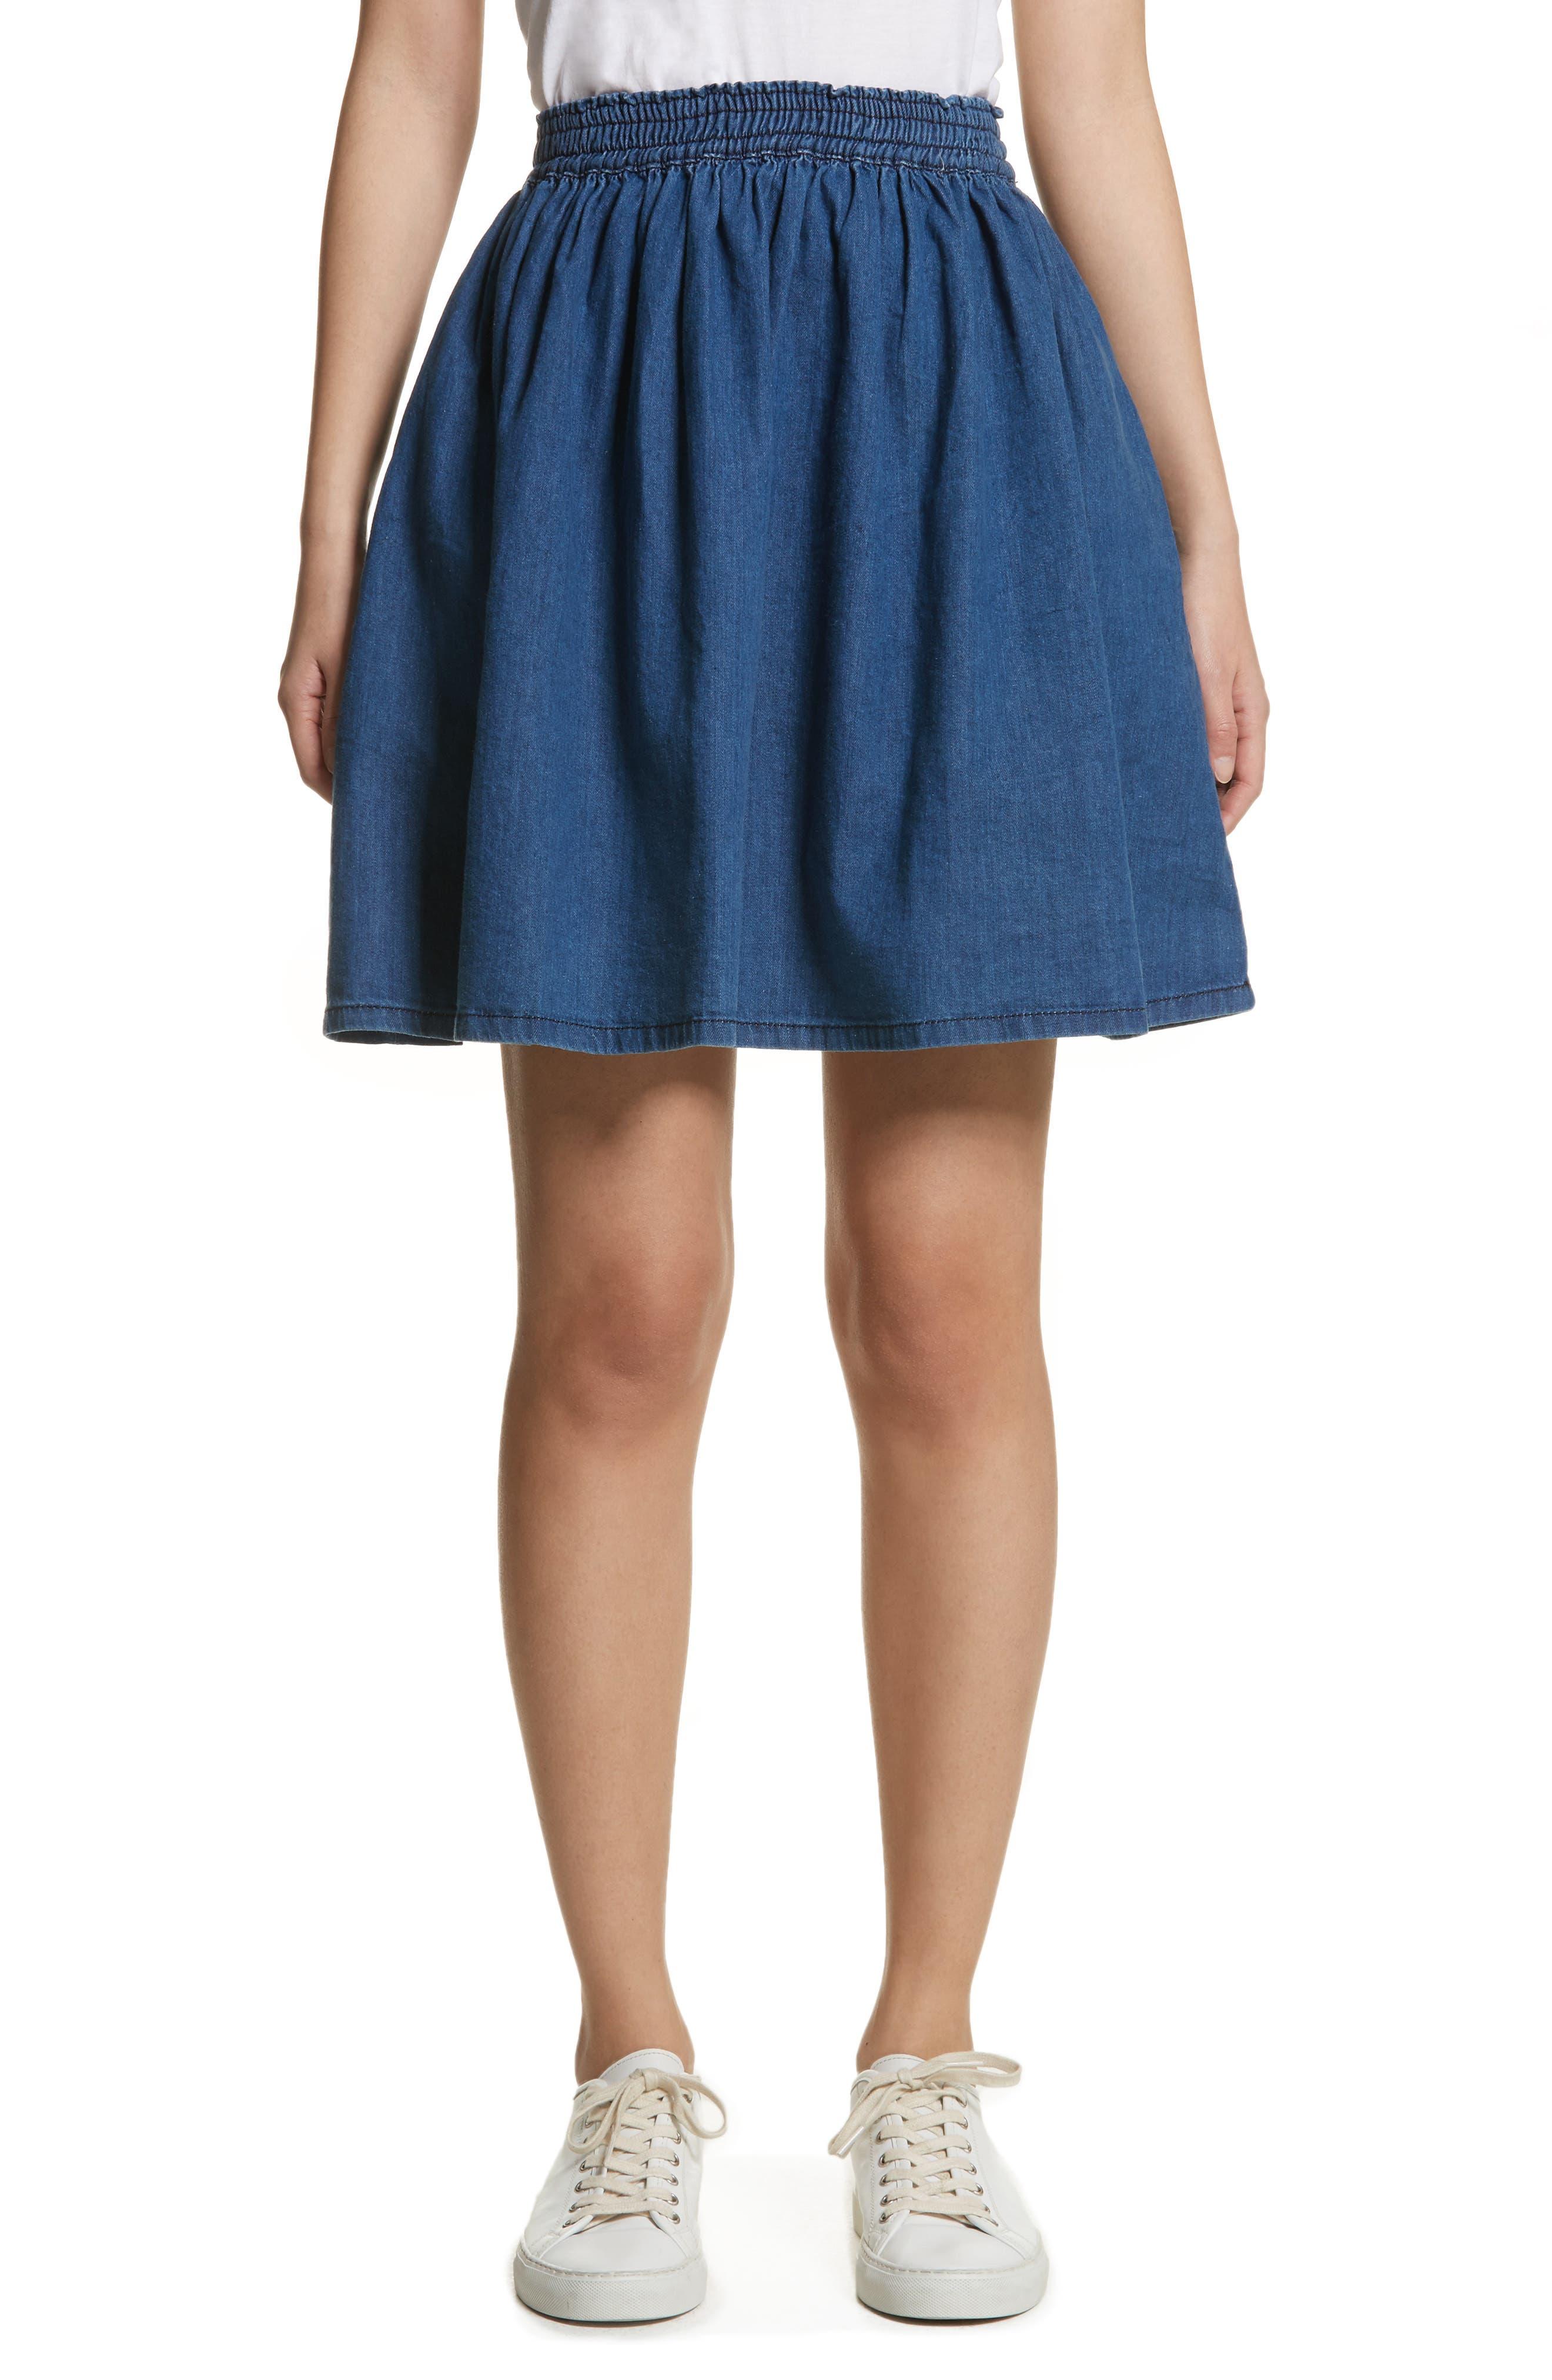 Alternate Image 1 Selected - The Great Court Denim Skirt